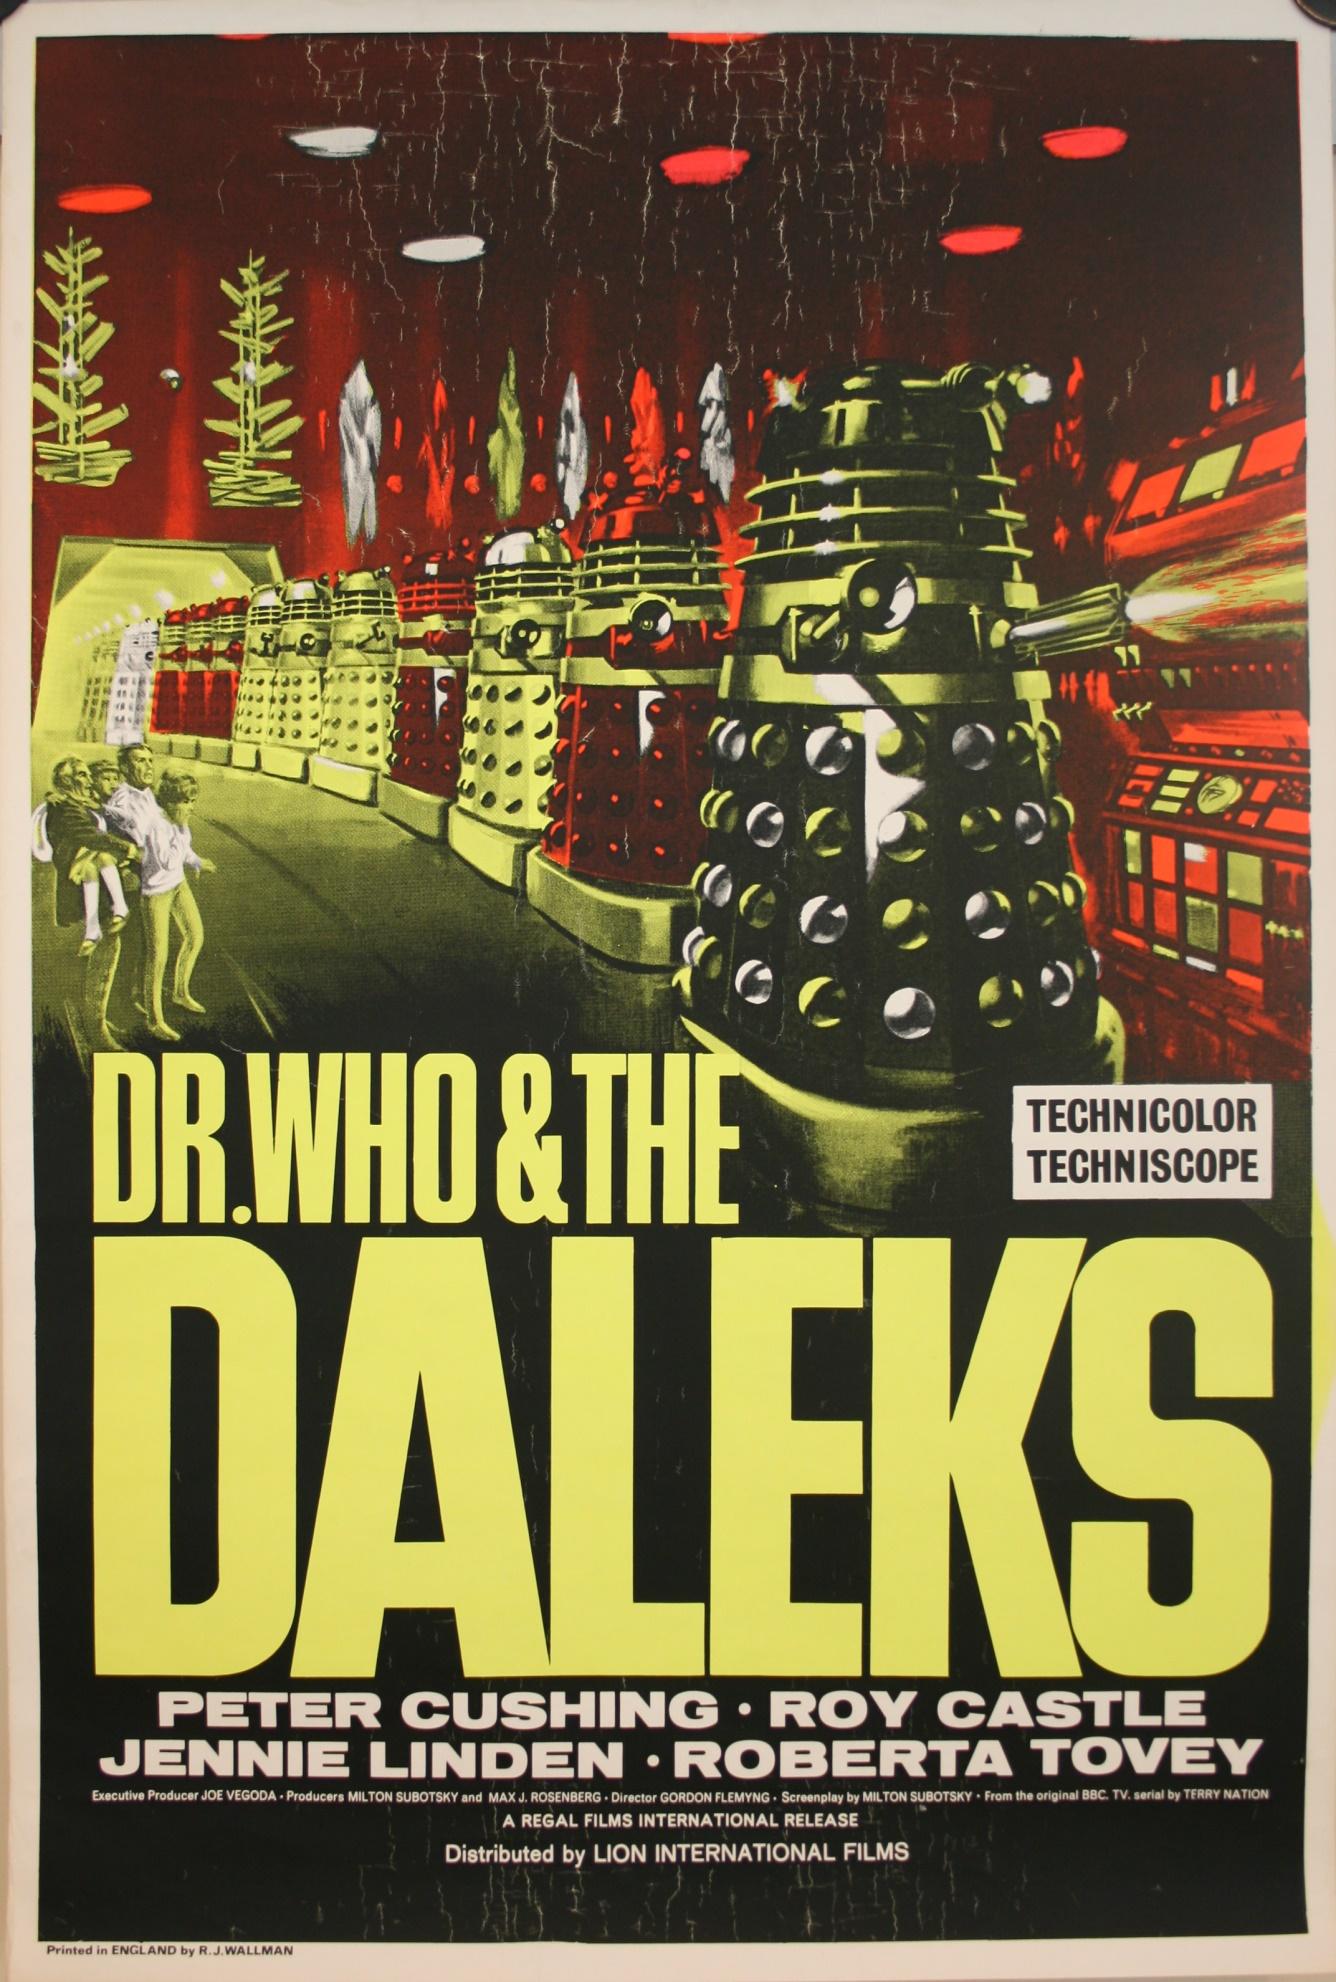 UK Rank Reissue One-Sheet Poster